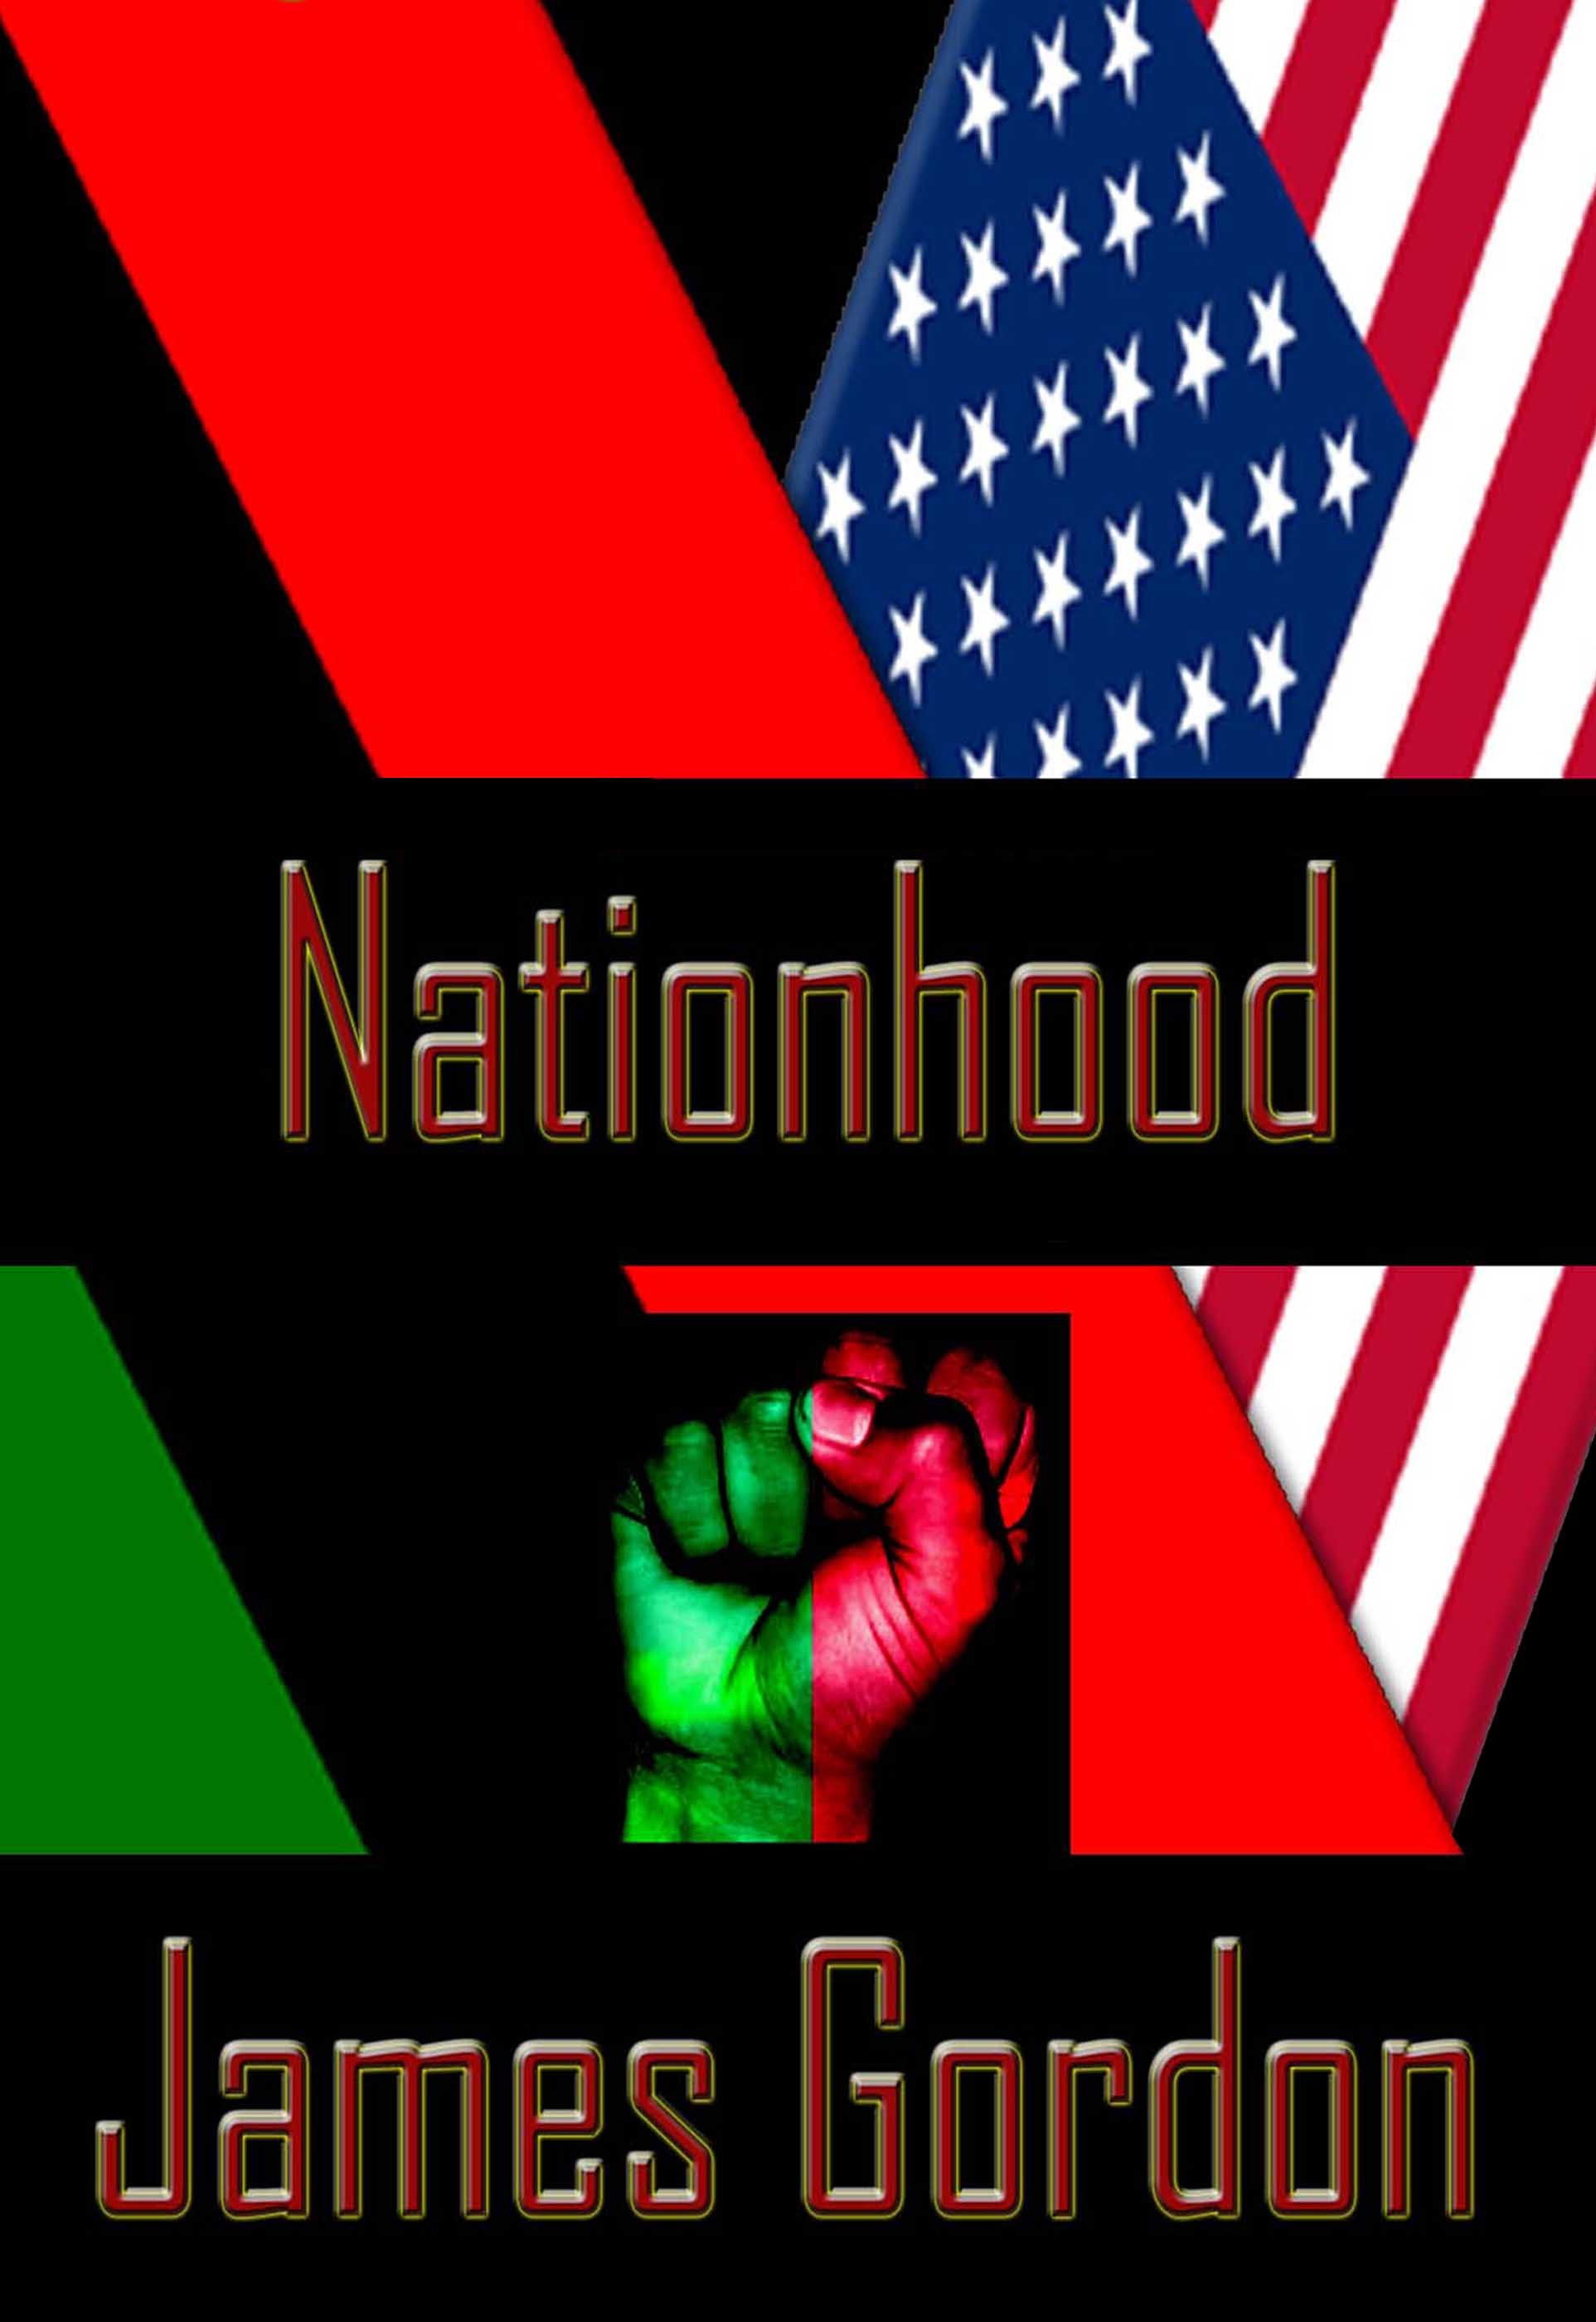 moving toward nationhood